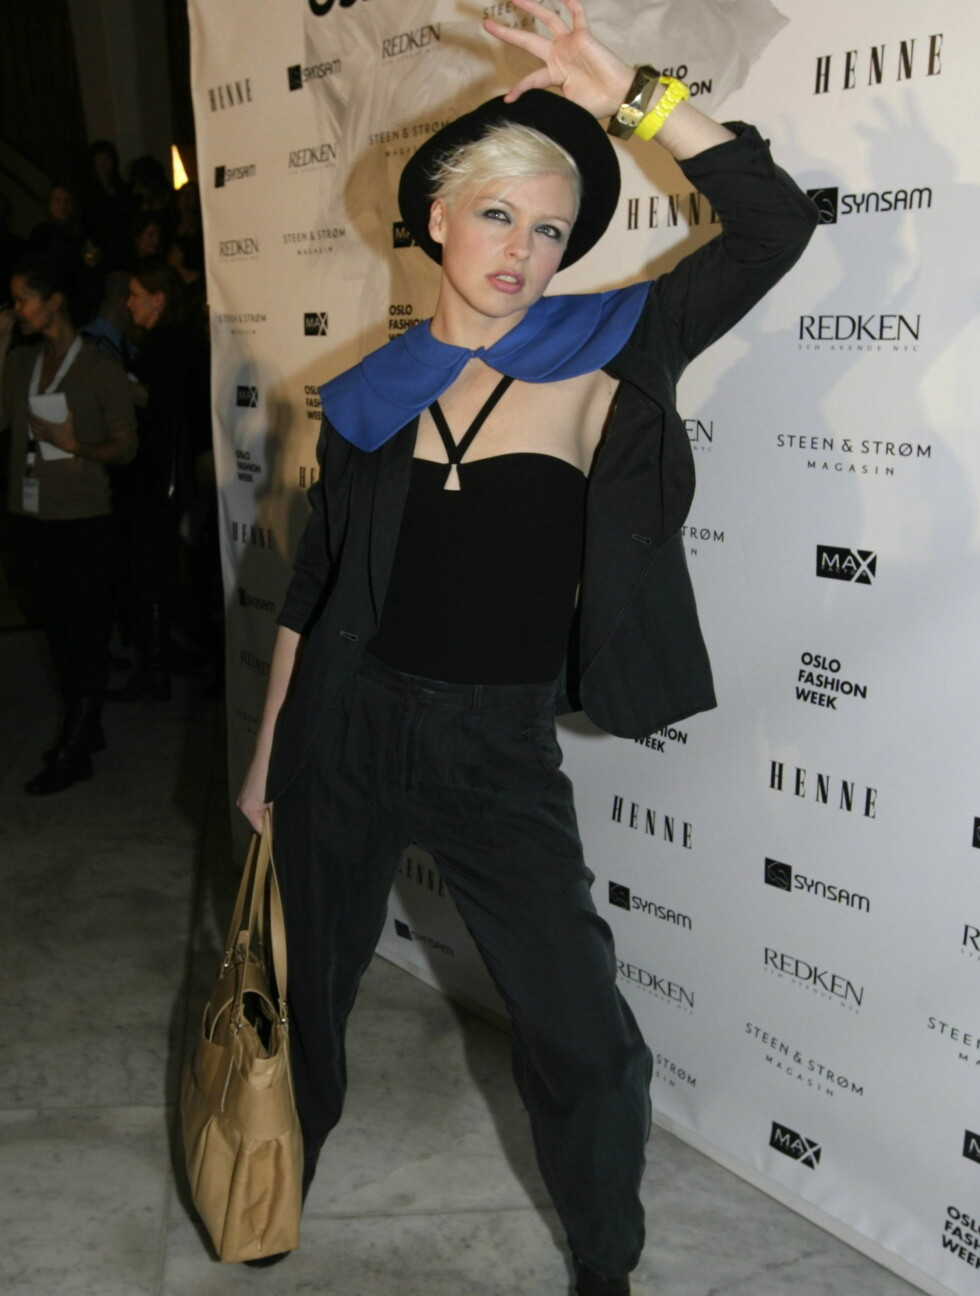 MASKULIN: Under Fashion Week for tre år siden kom Mariann i sort dress og matchende hatt. Foto: SCANPIX